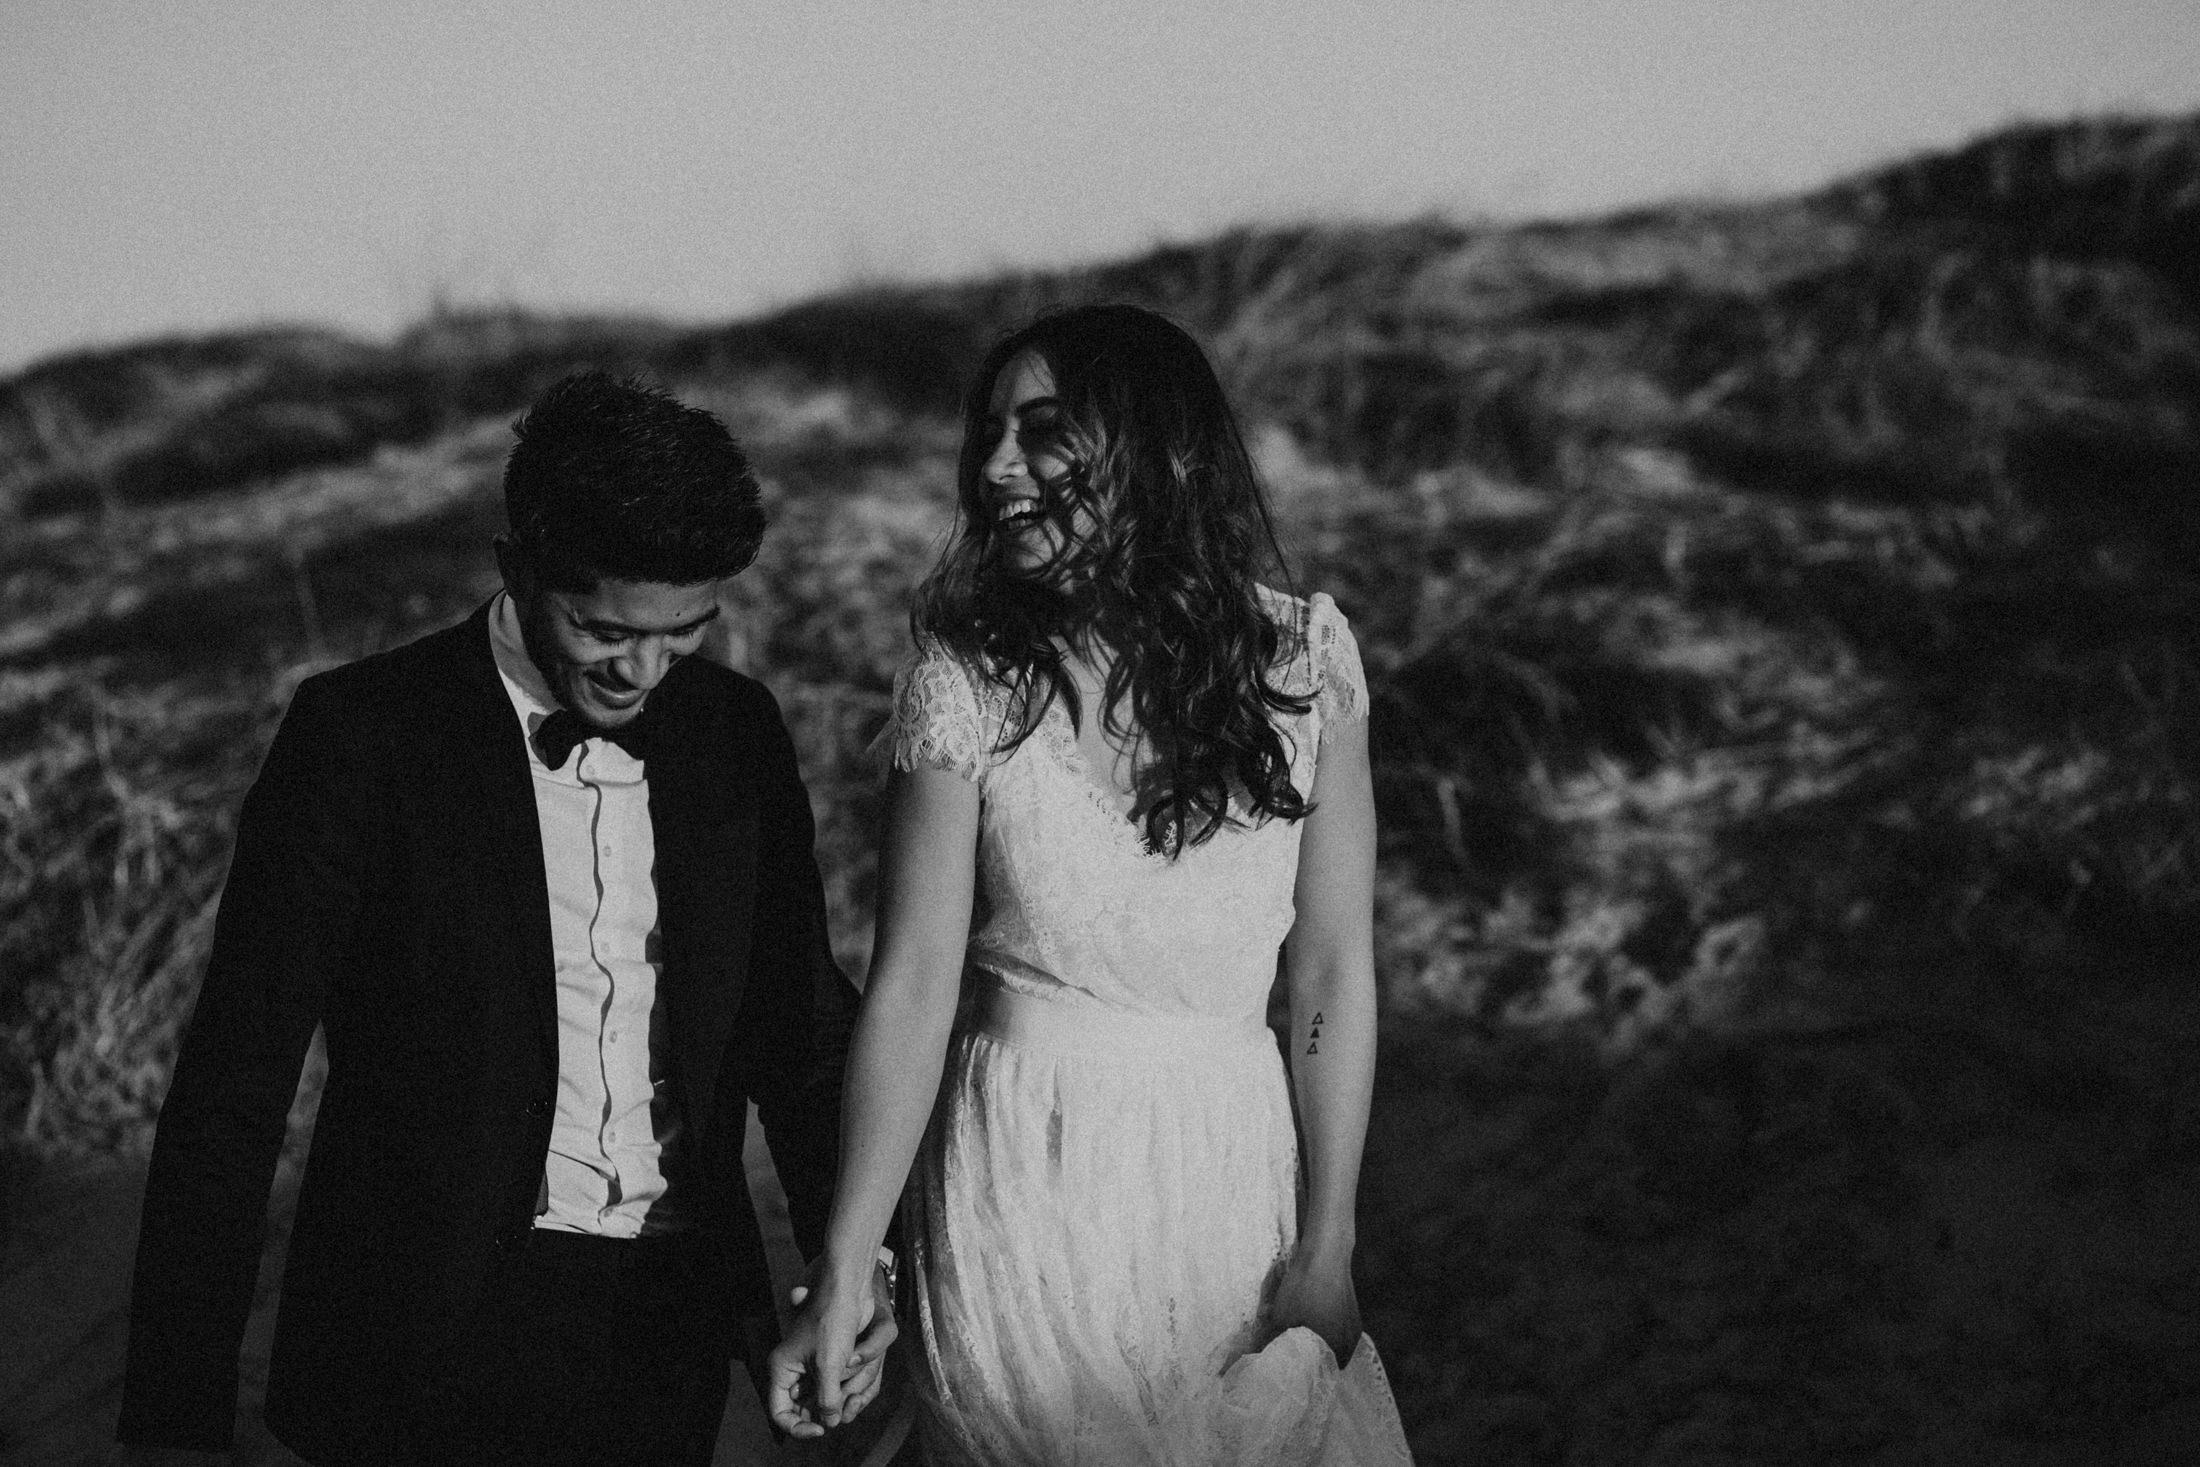 Wedding_Photographer_Mallorca_Daniela-Marquardt_Photography_CanaryIslands_Lanzarote_Iceland_Tuskany_Santorini_Portugal_Schweiz_Austria_Bayern_Elopement_Hochzeitsfotograf_Norddeichich_38